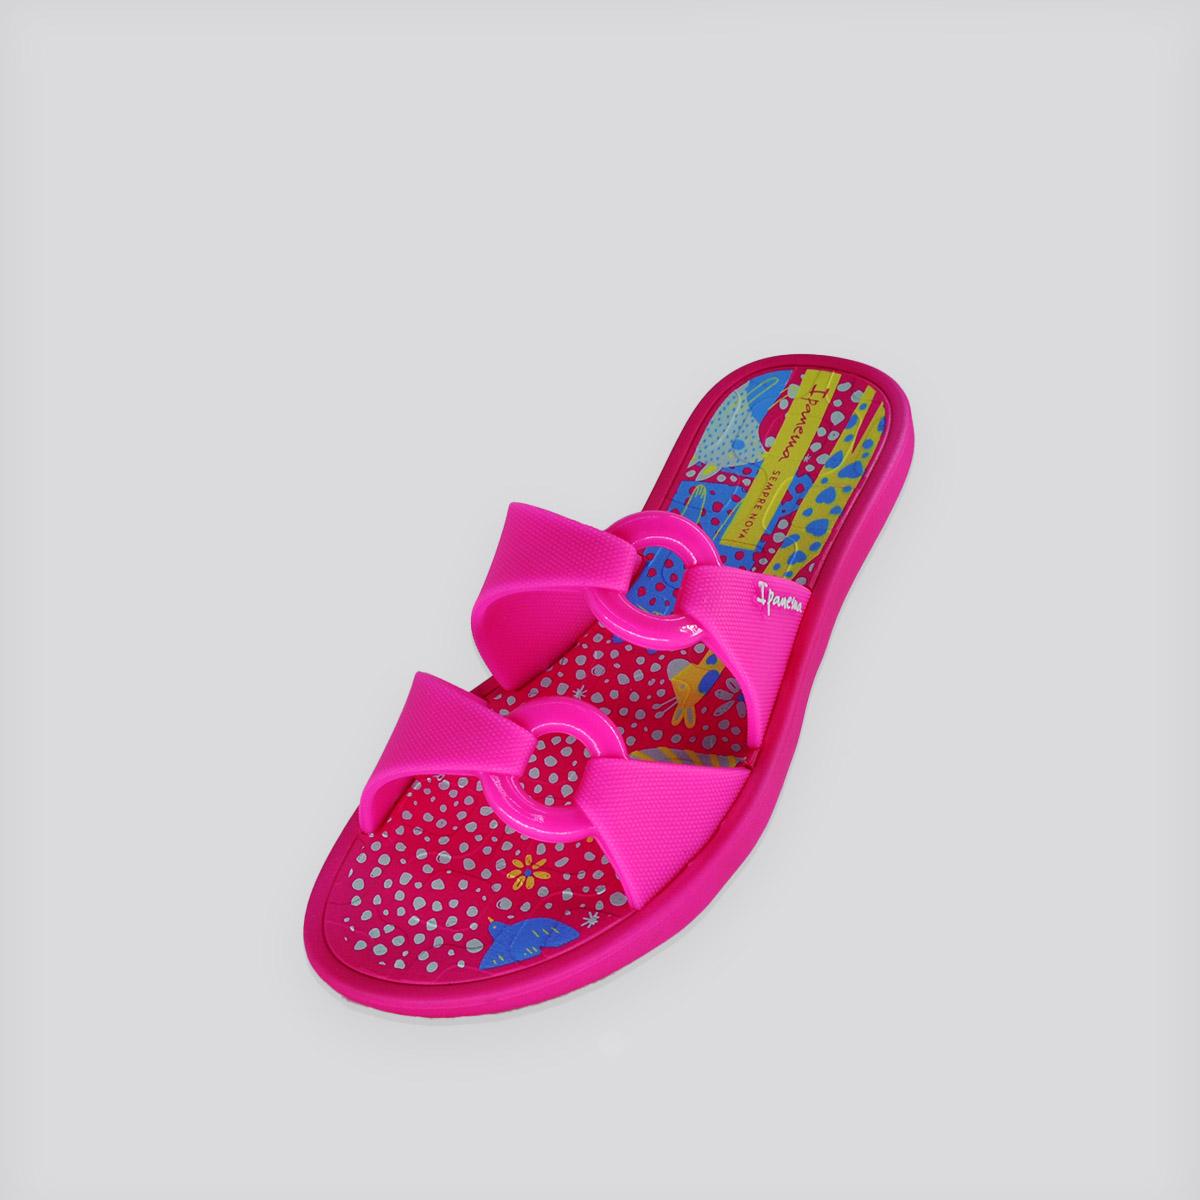 Chinelo Infantil Ipanema Ella Print Rosa/Amarelo